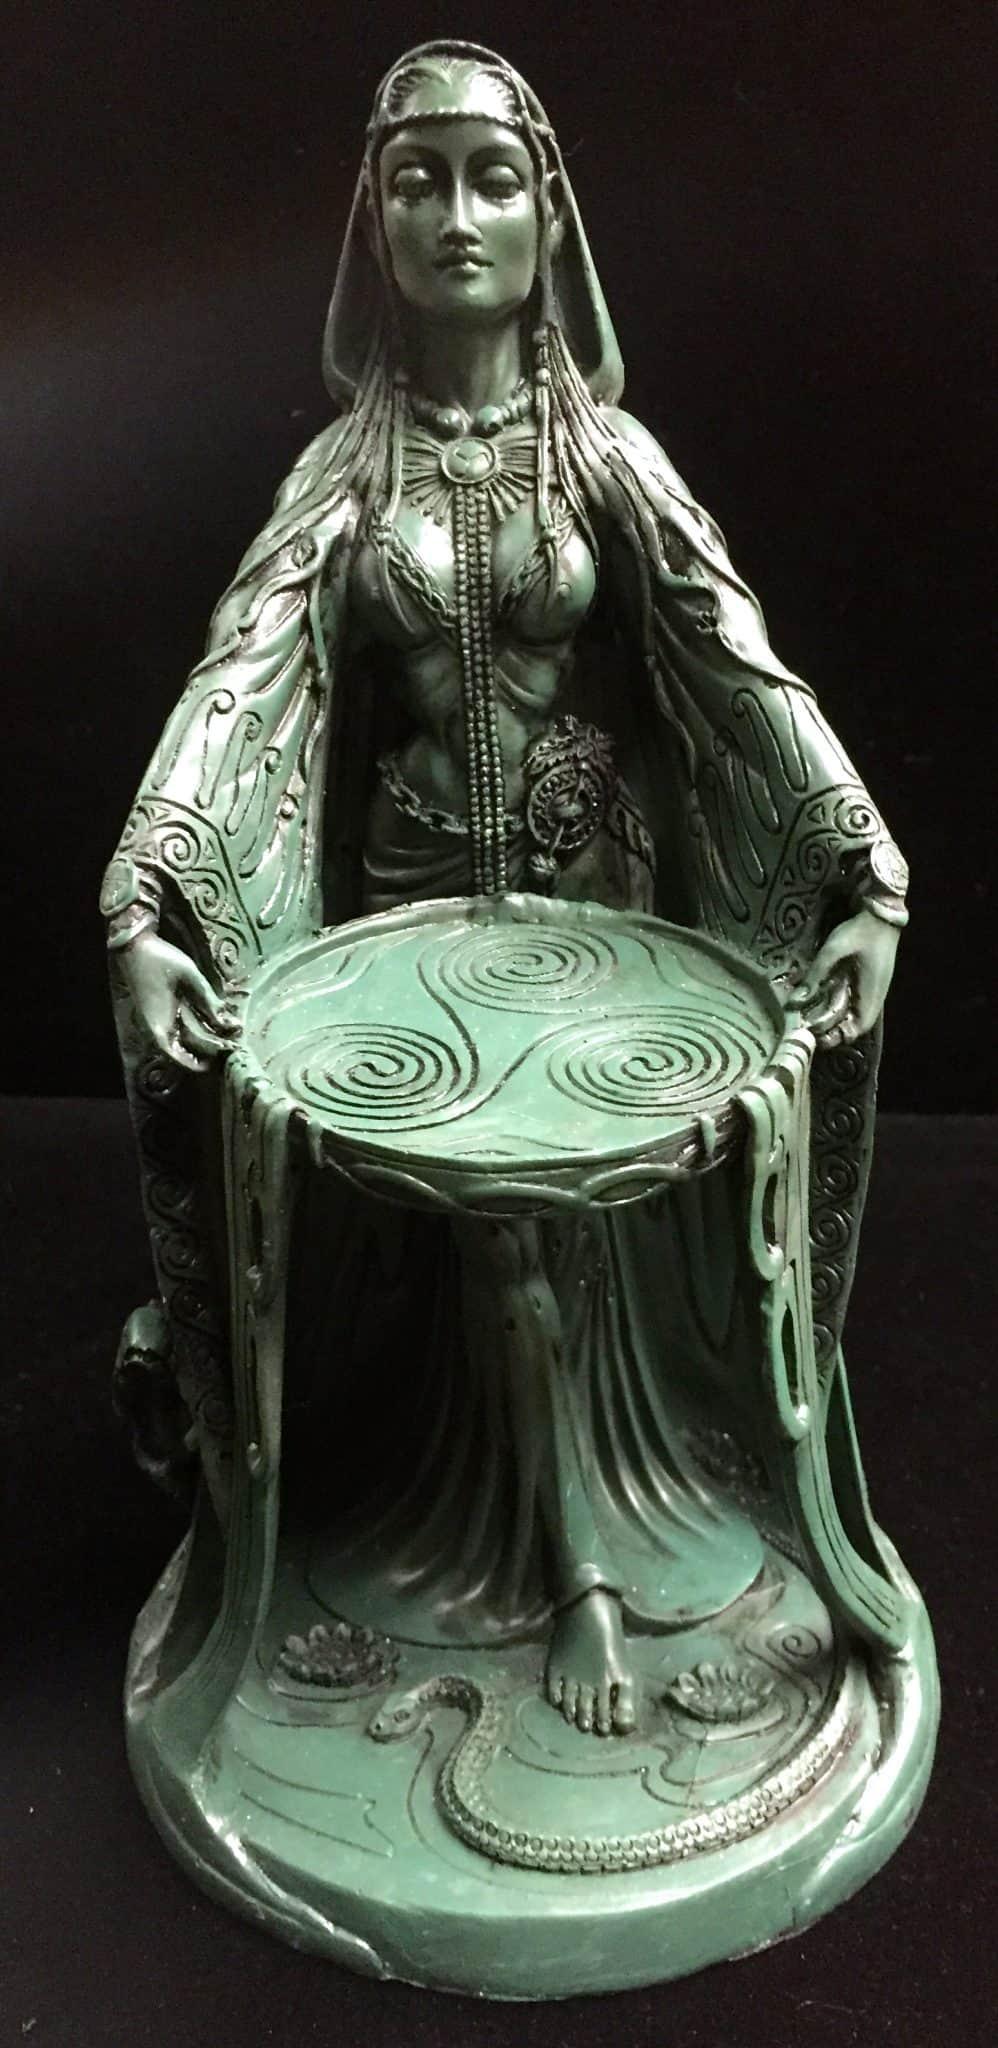 Celtic Goddess Danu Green Bronze Resin Statue by Maxine Miller ©Maxine Miller - Front